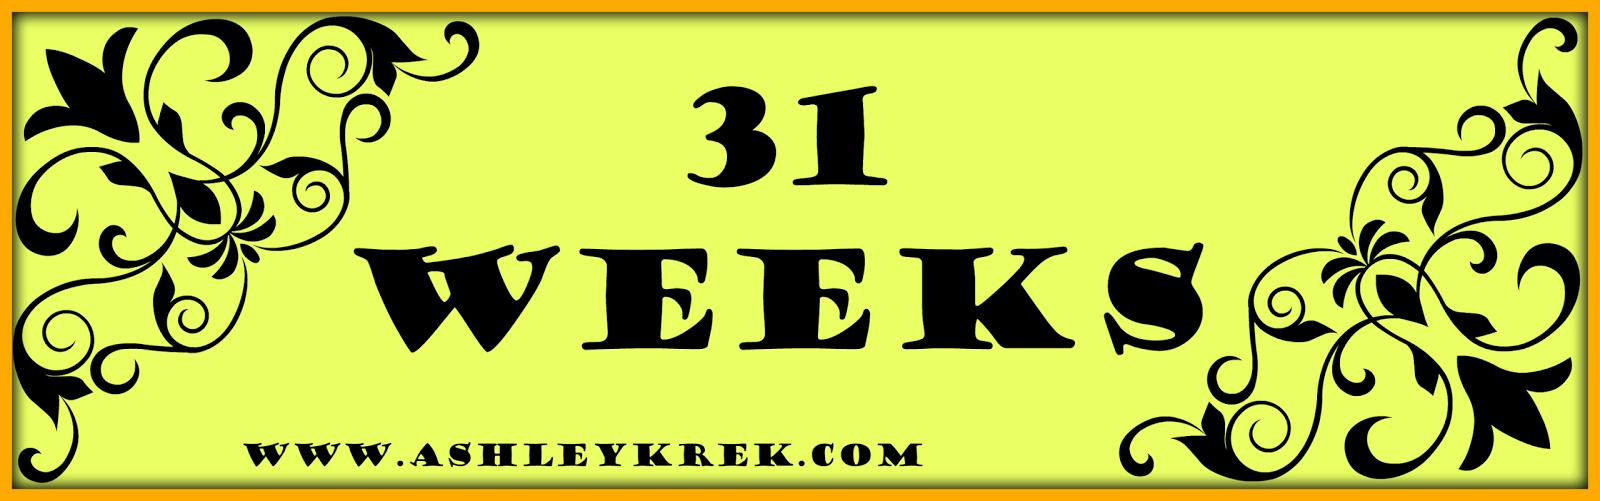 31 week baby bump